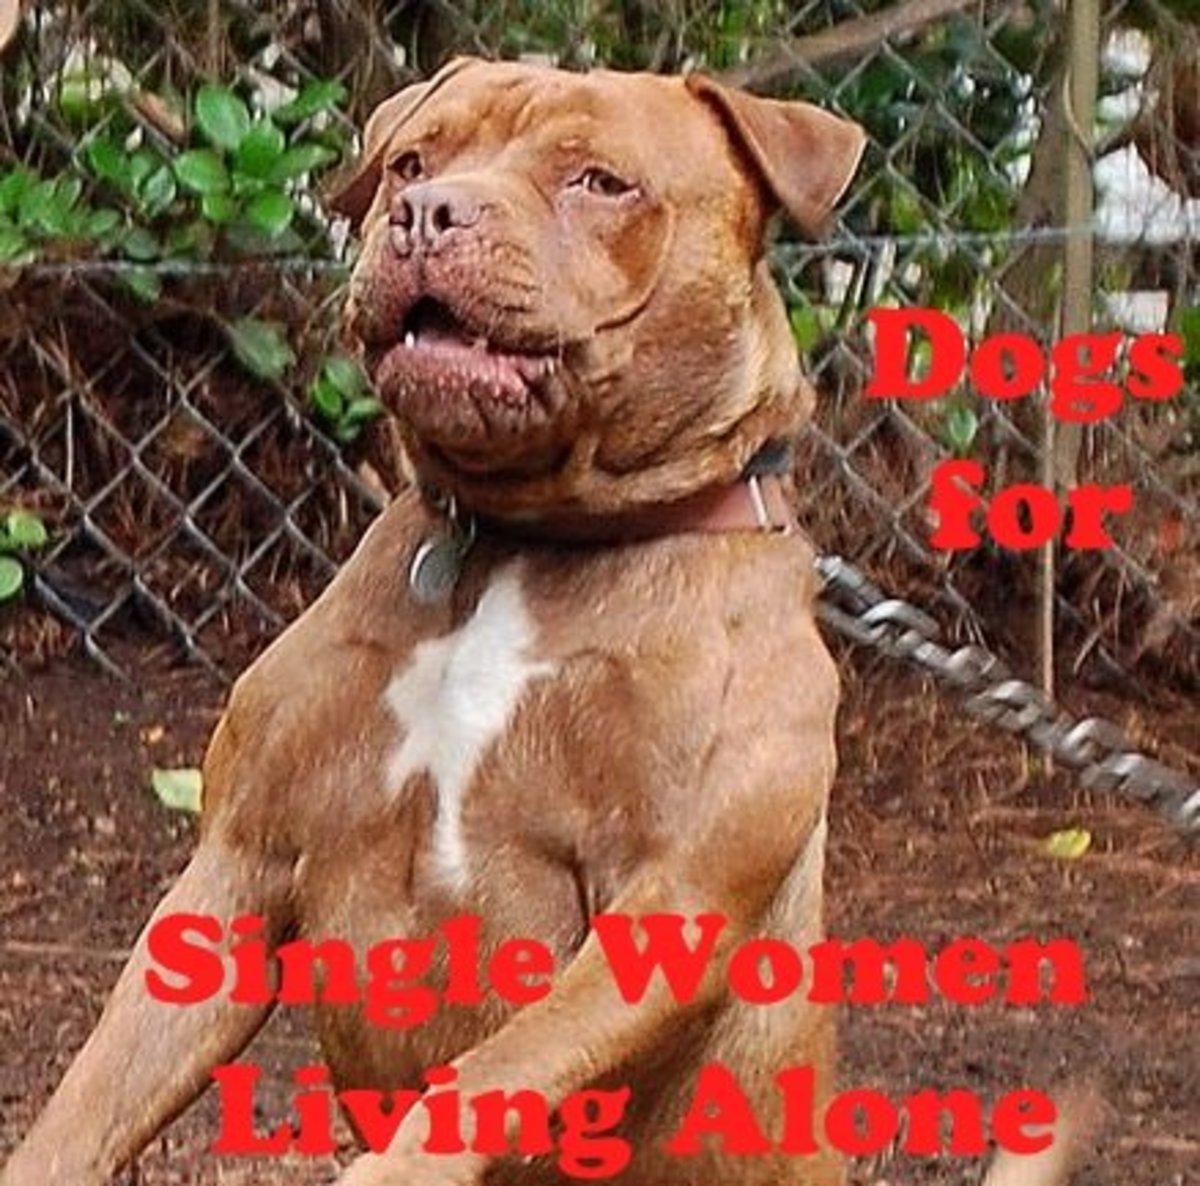 5 Best Dog Breeds for Single Women Living Alone